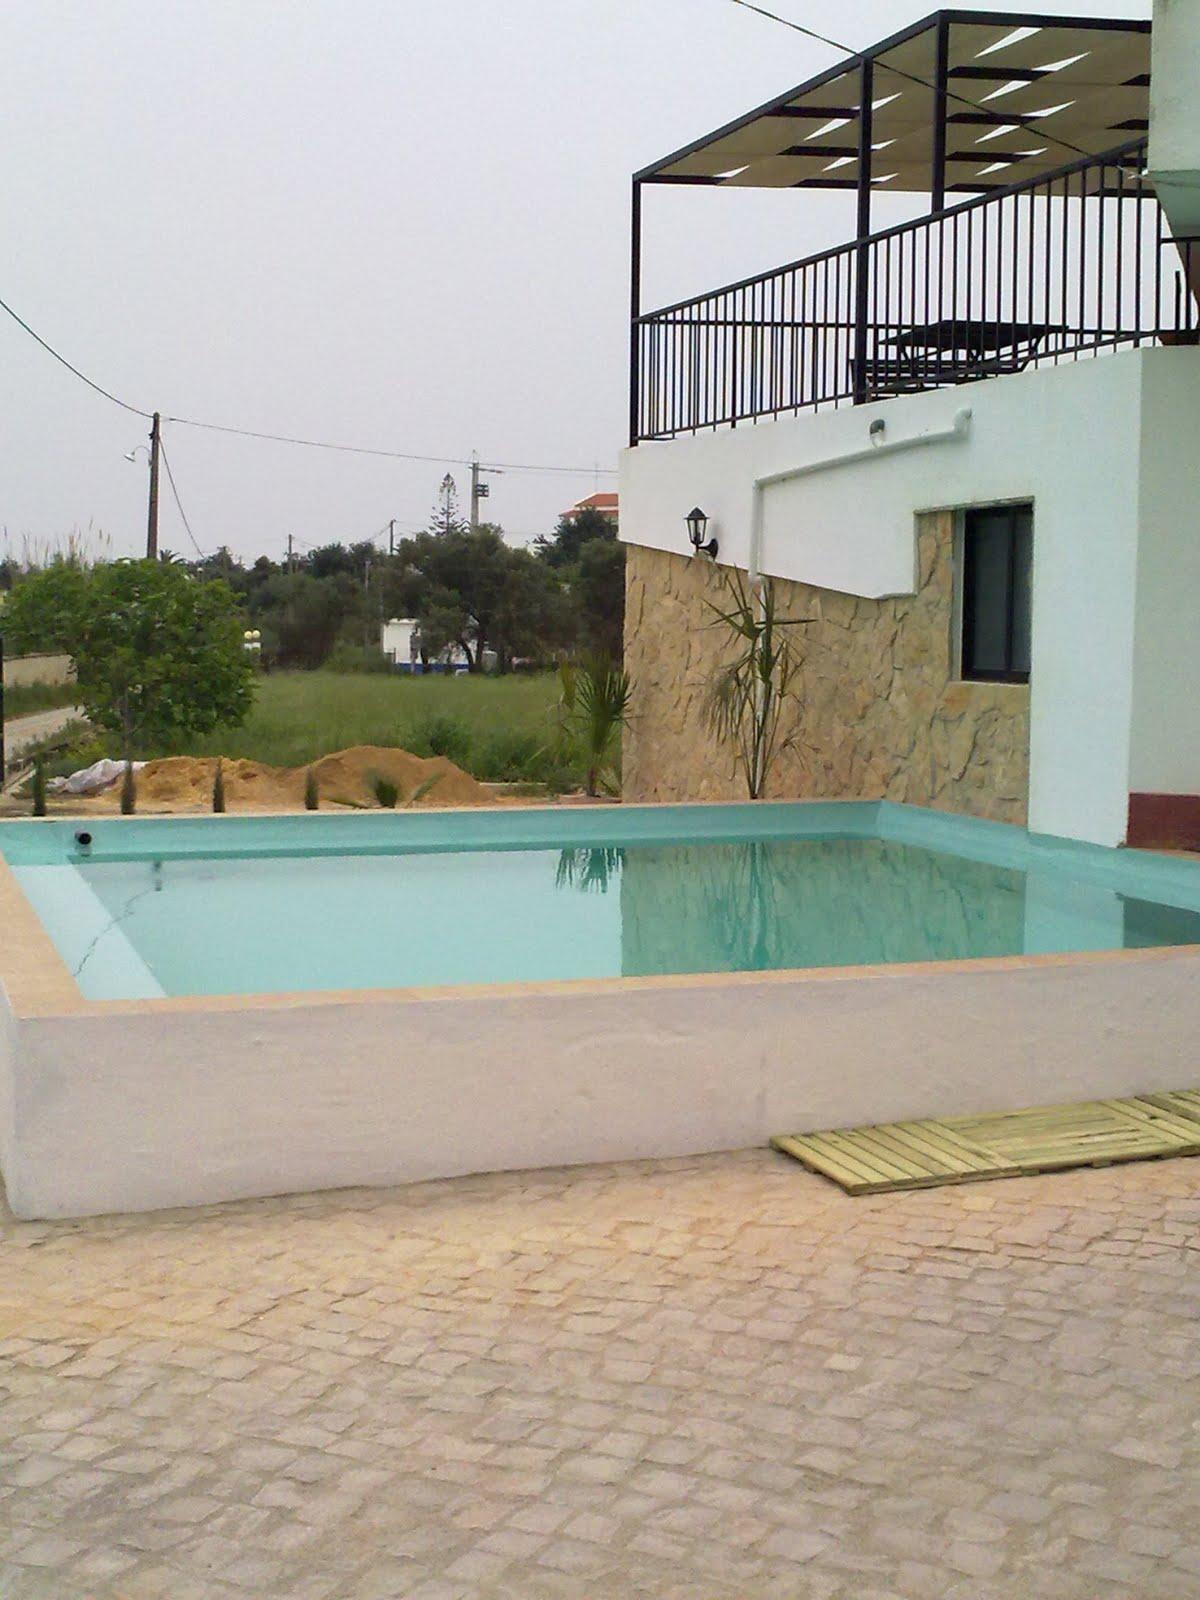 Casa do pinheiro a piscina da casa for Piscinas desmontables profundas